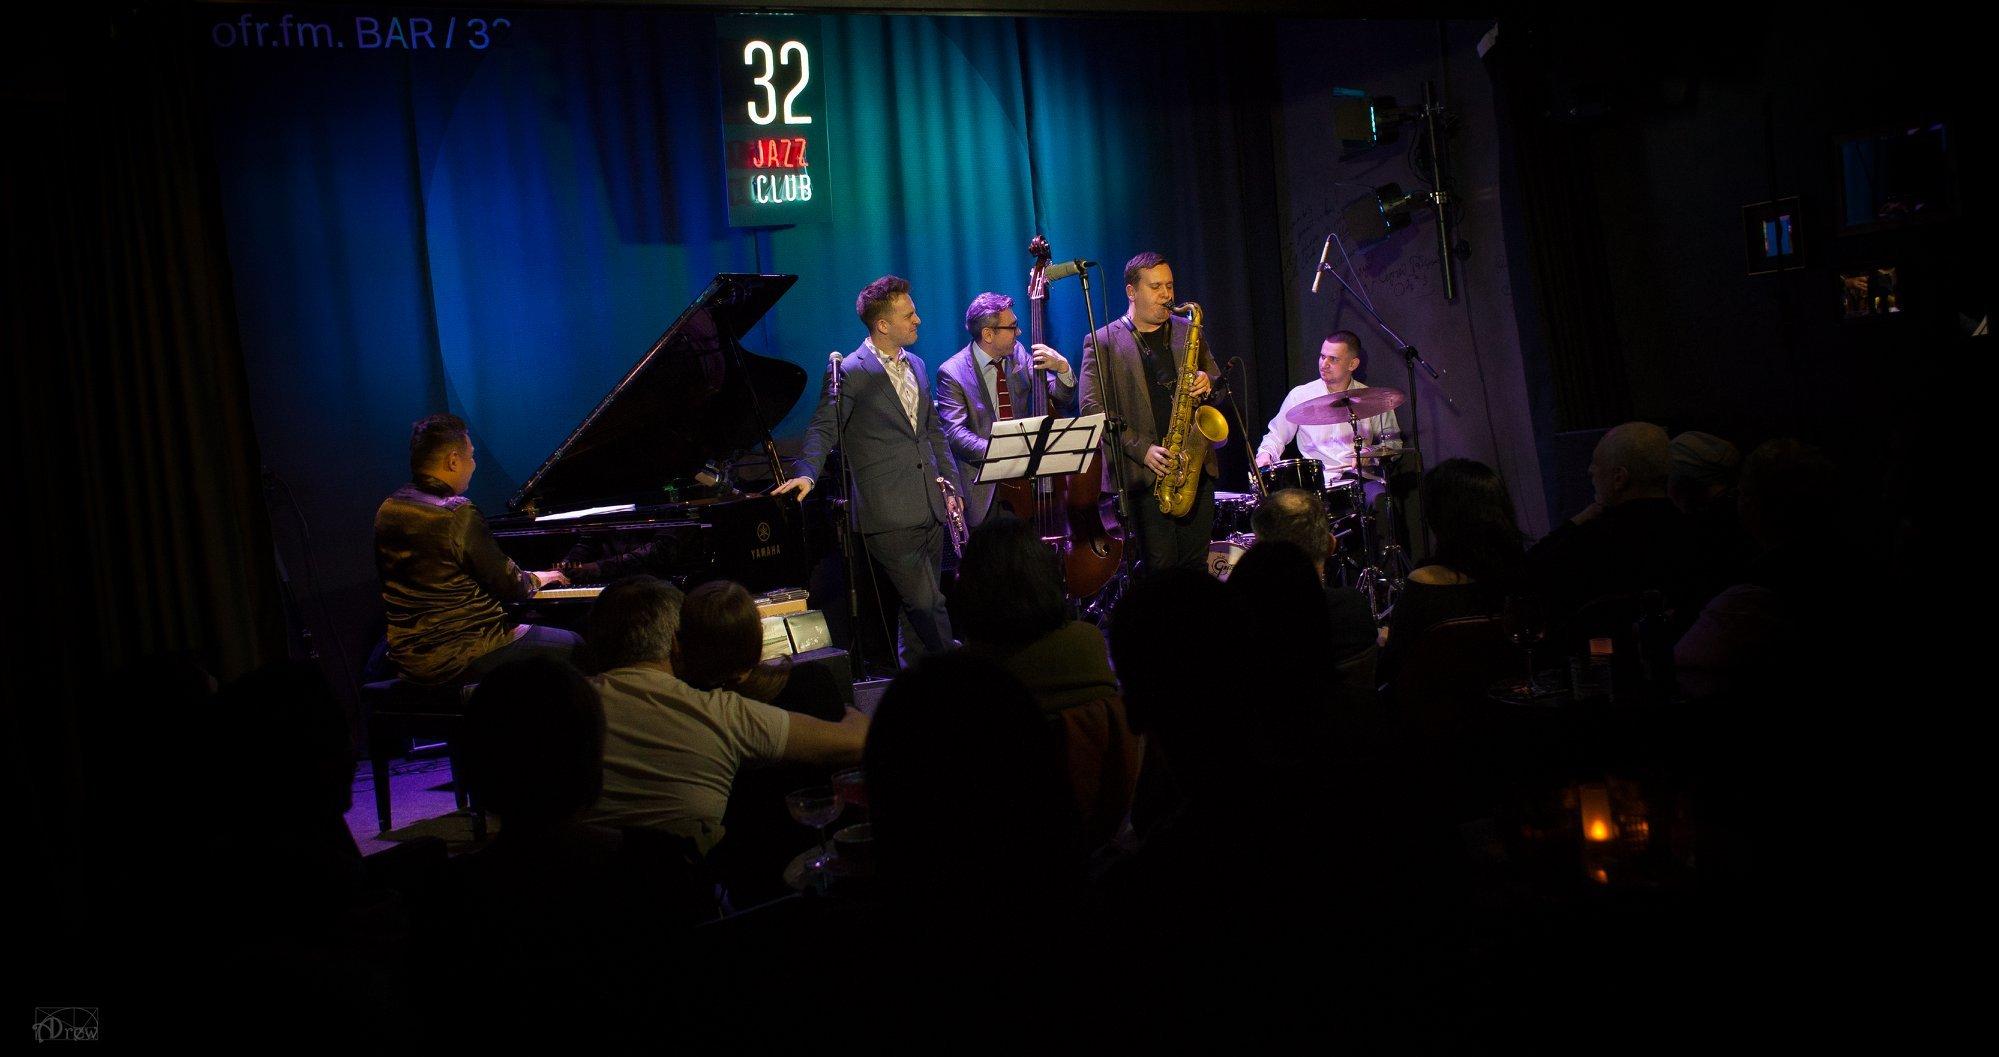 Ark Ovrucki New York Quartet feat. Benny Benack